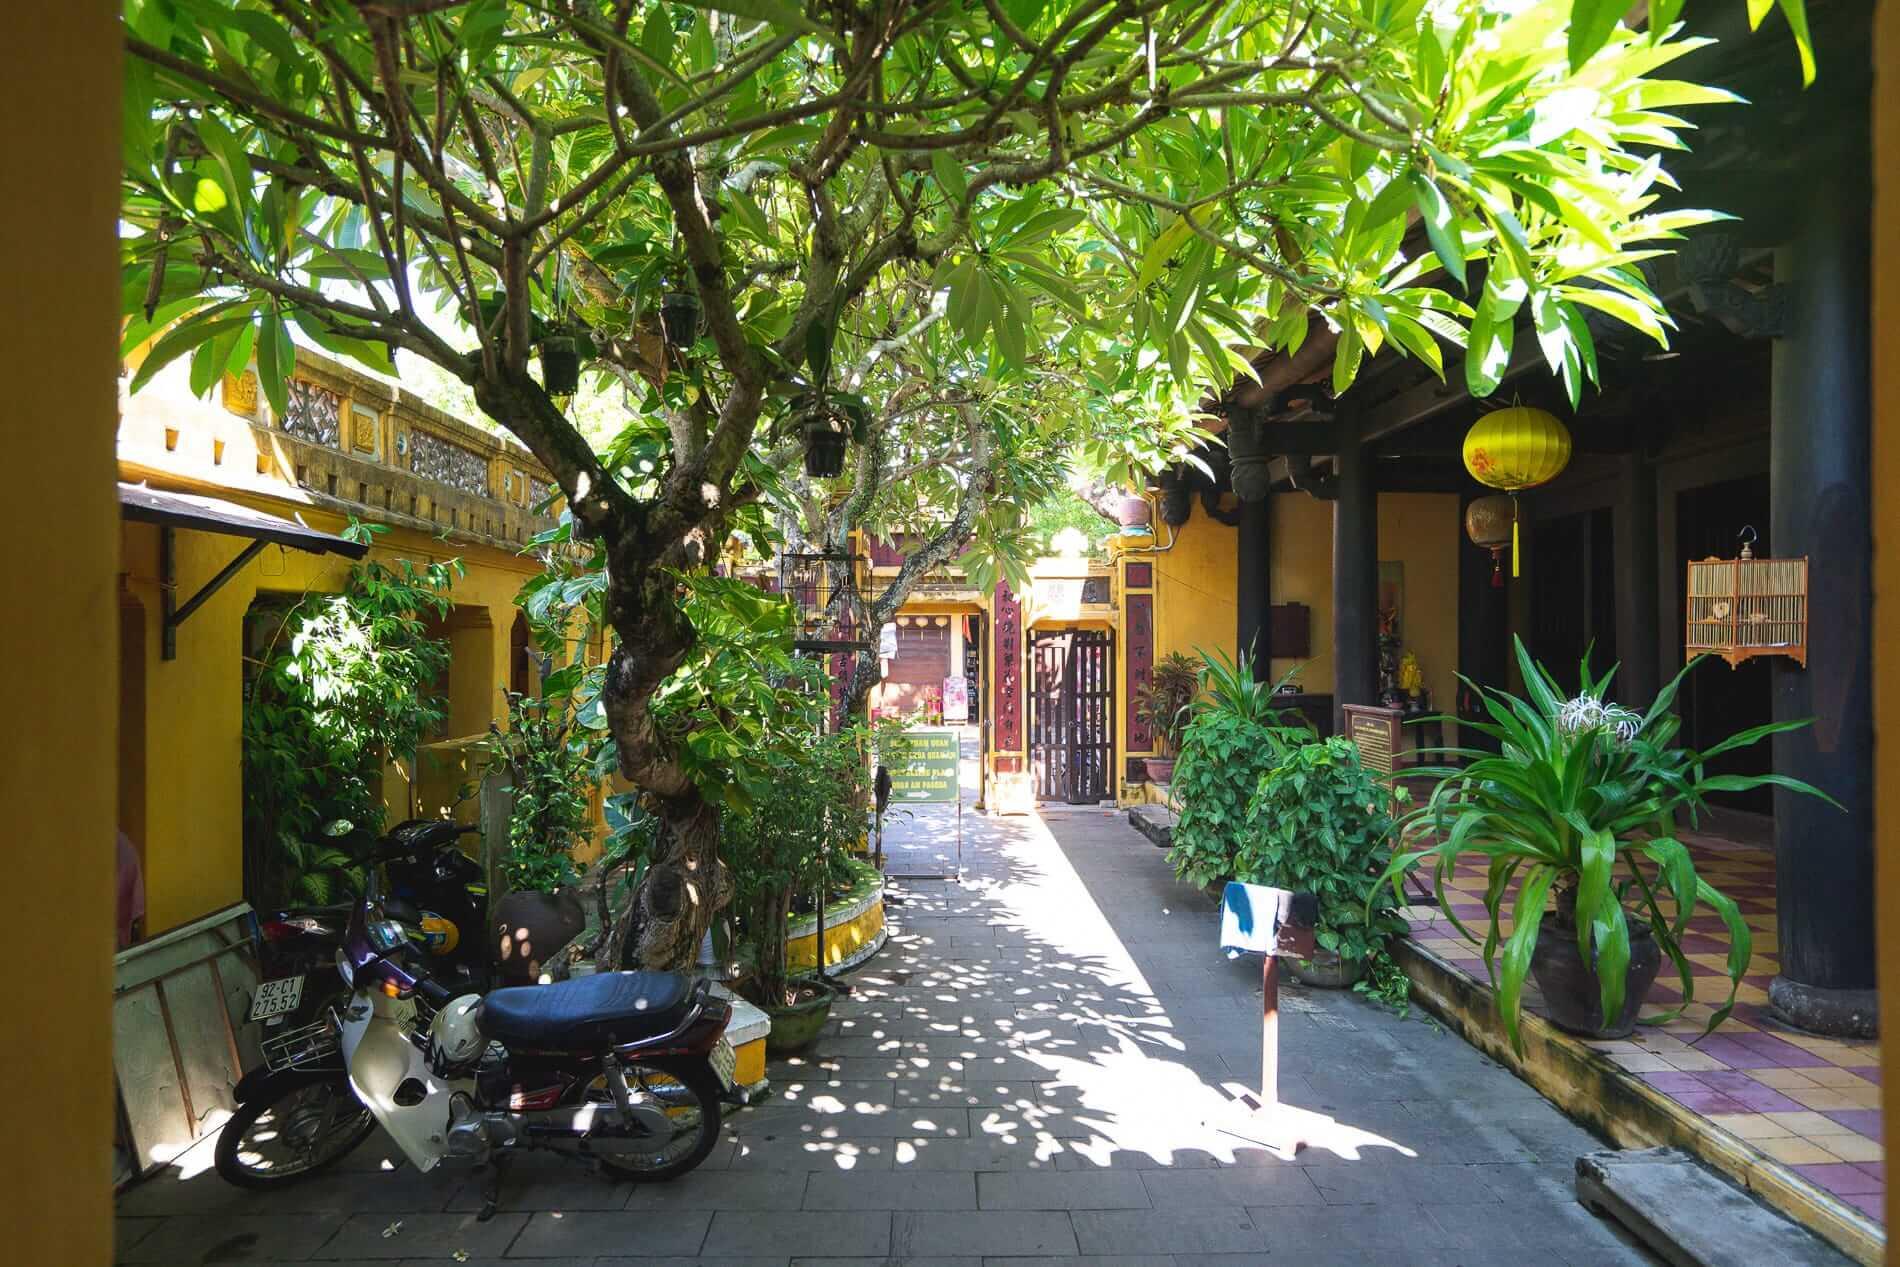 Quan Am Pagoda - Hoi An Ancient Town